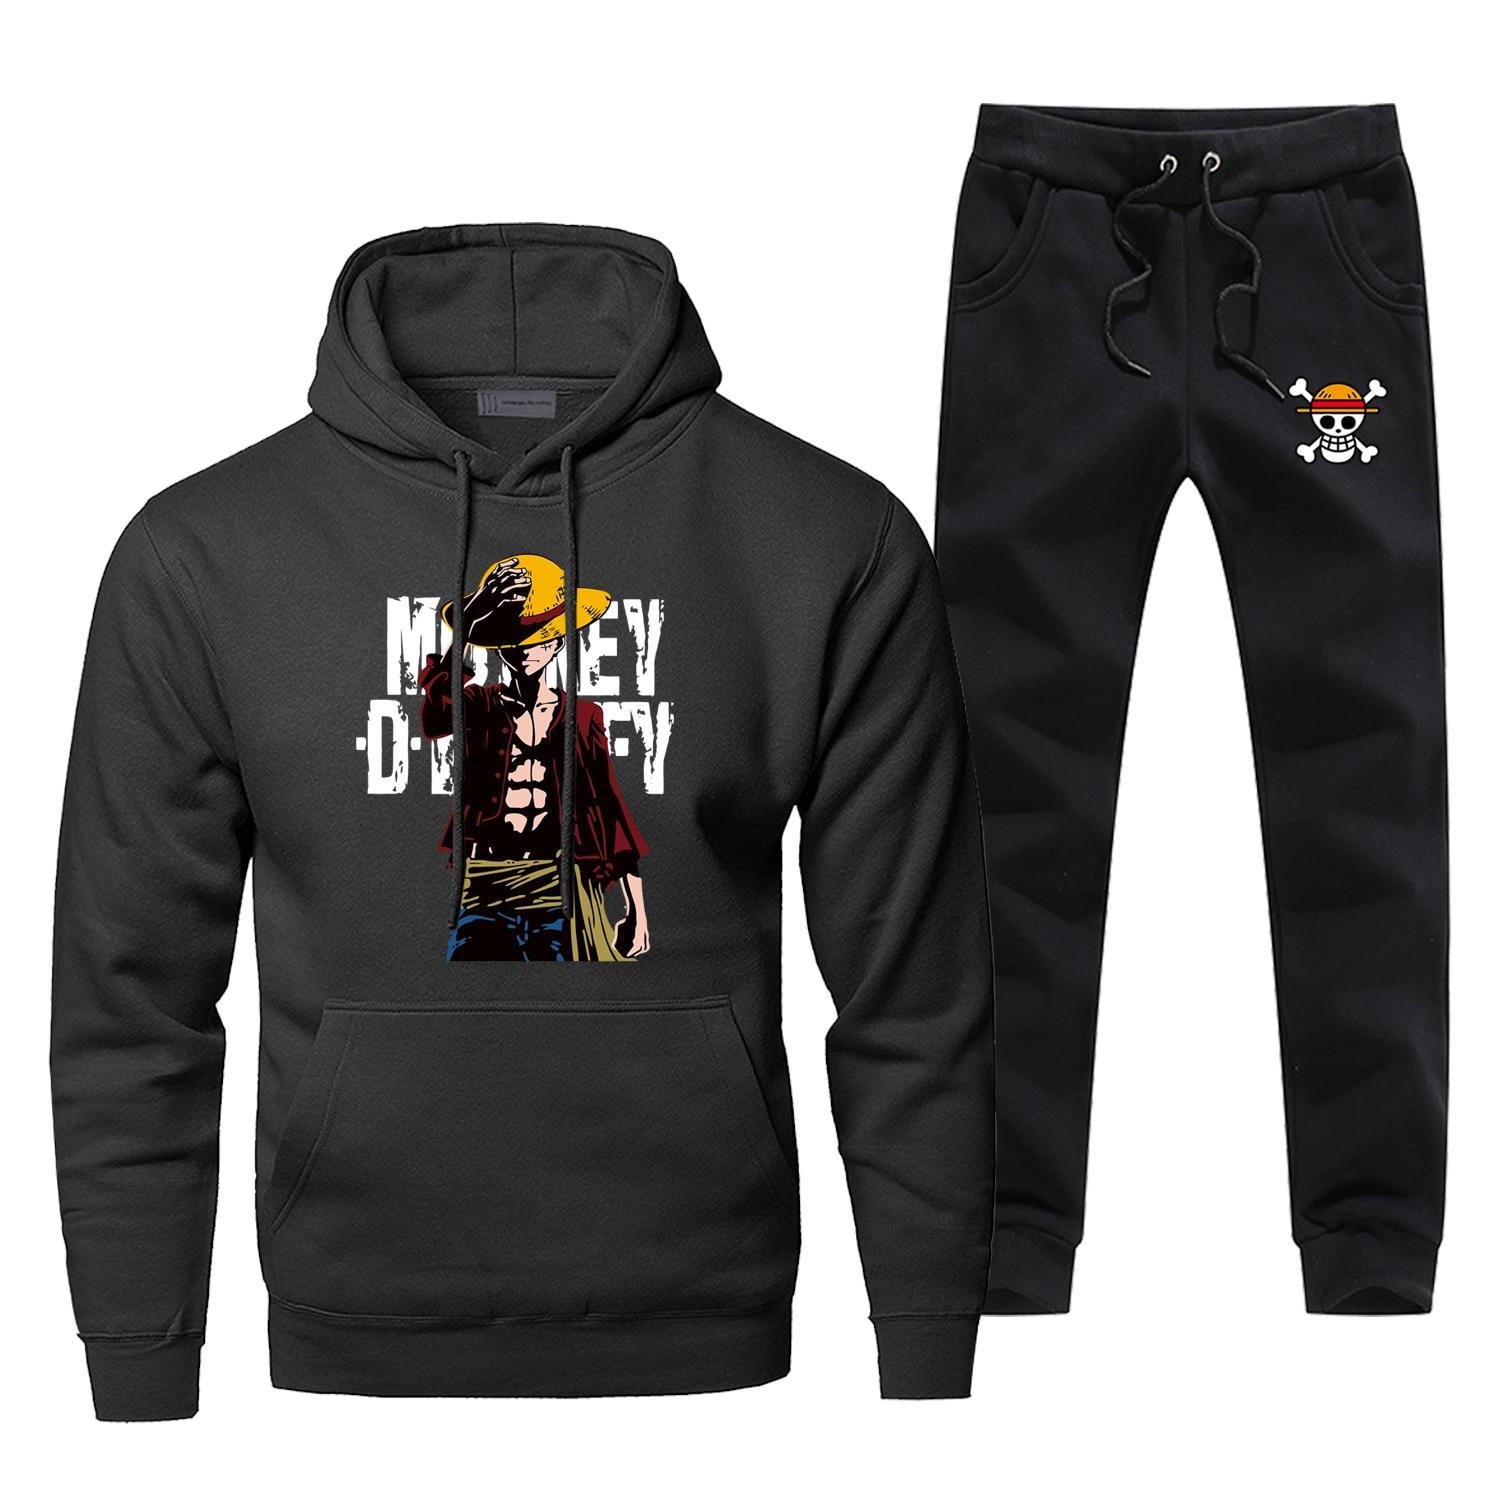 One Piece Hoodies Pants Men Sets Japanese Anime Luffy Track Suit Pant Sweatshirt Sweatpants Sportswear Autumn 2 PCS Tracksuit